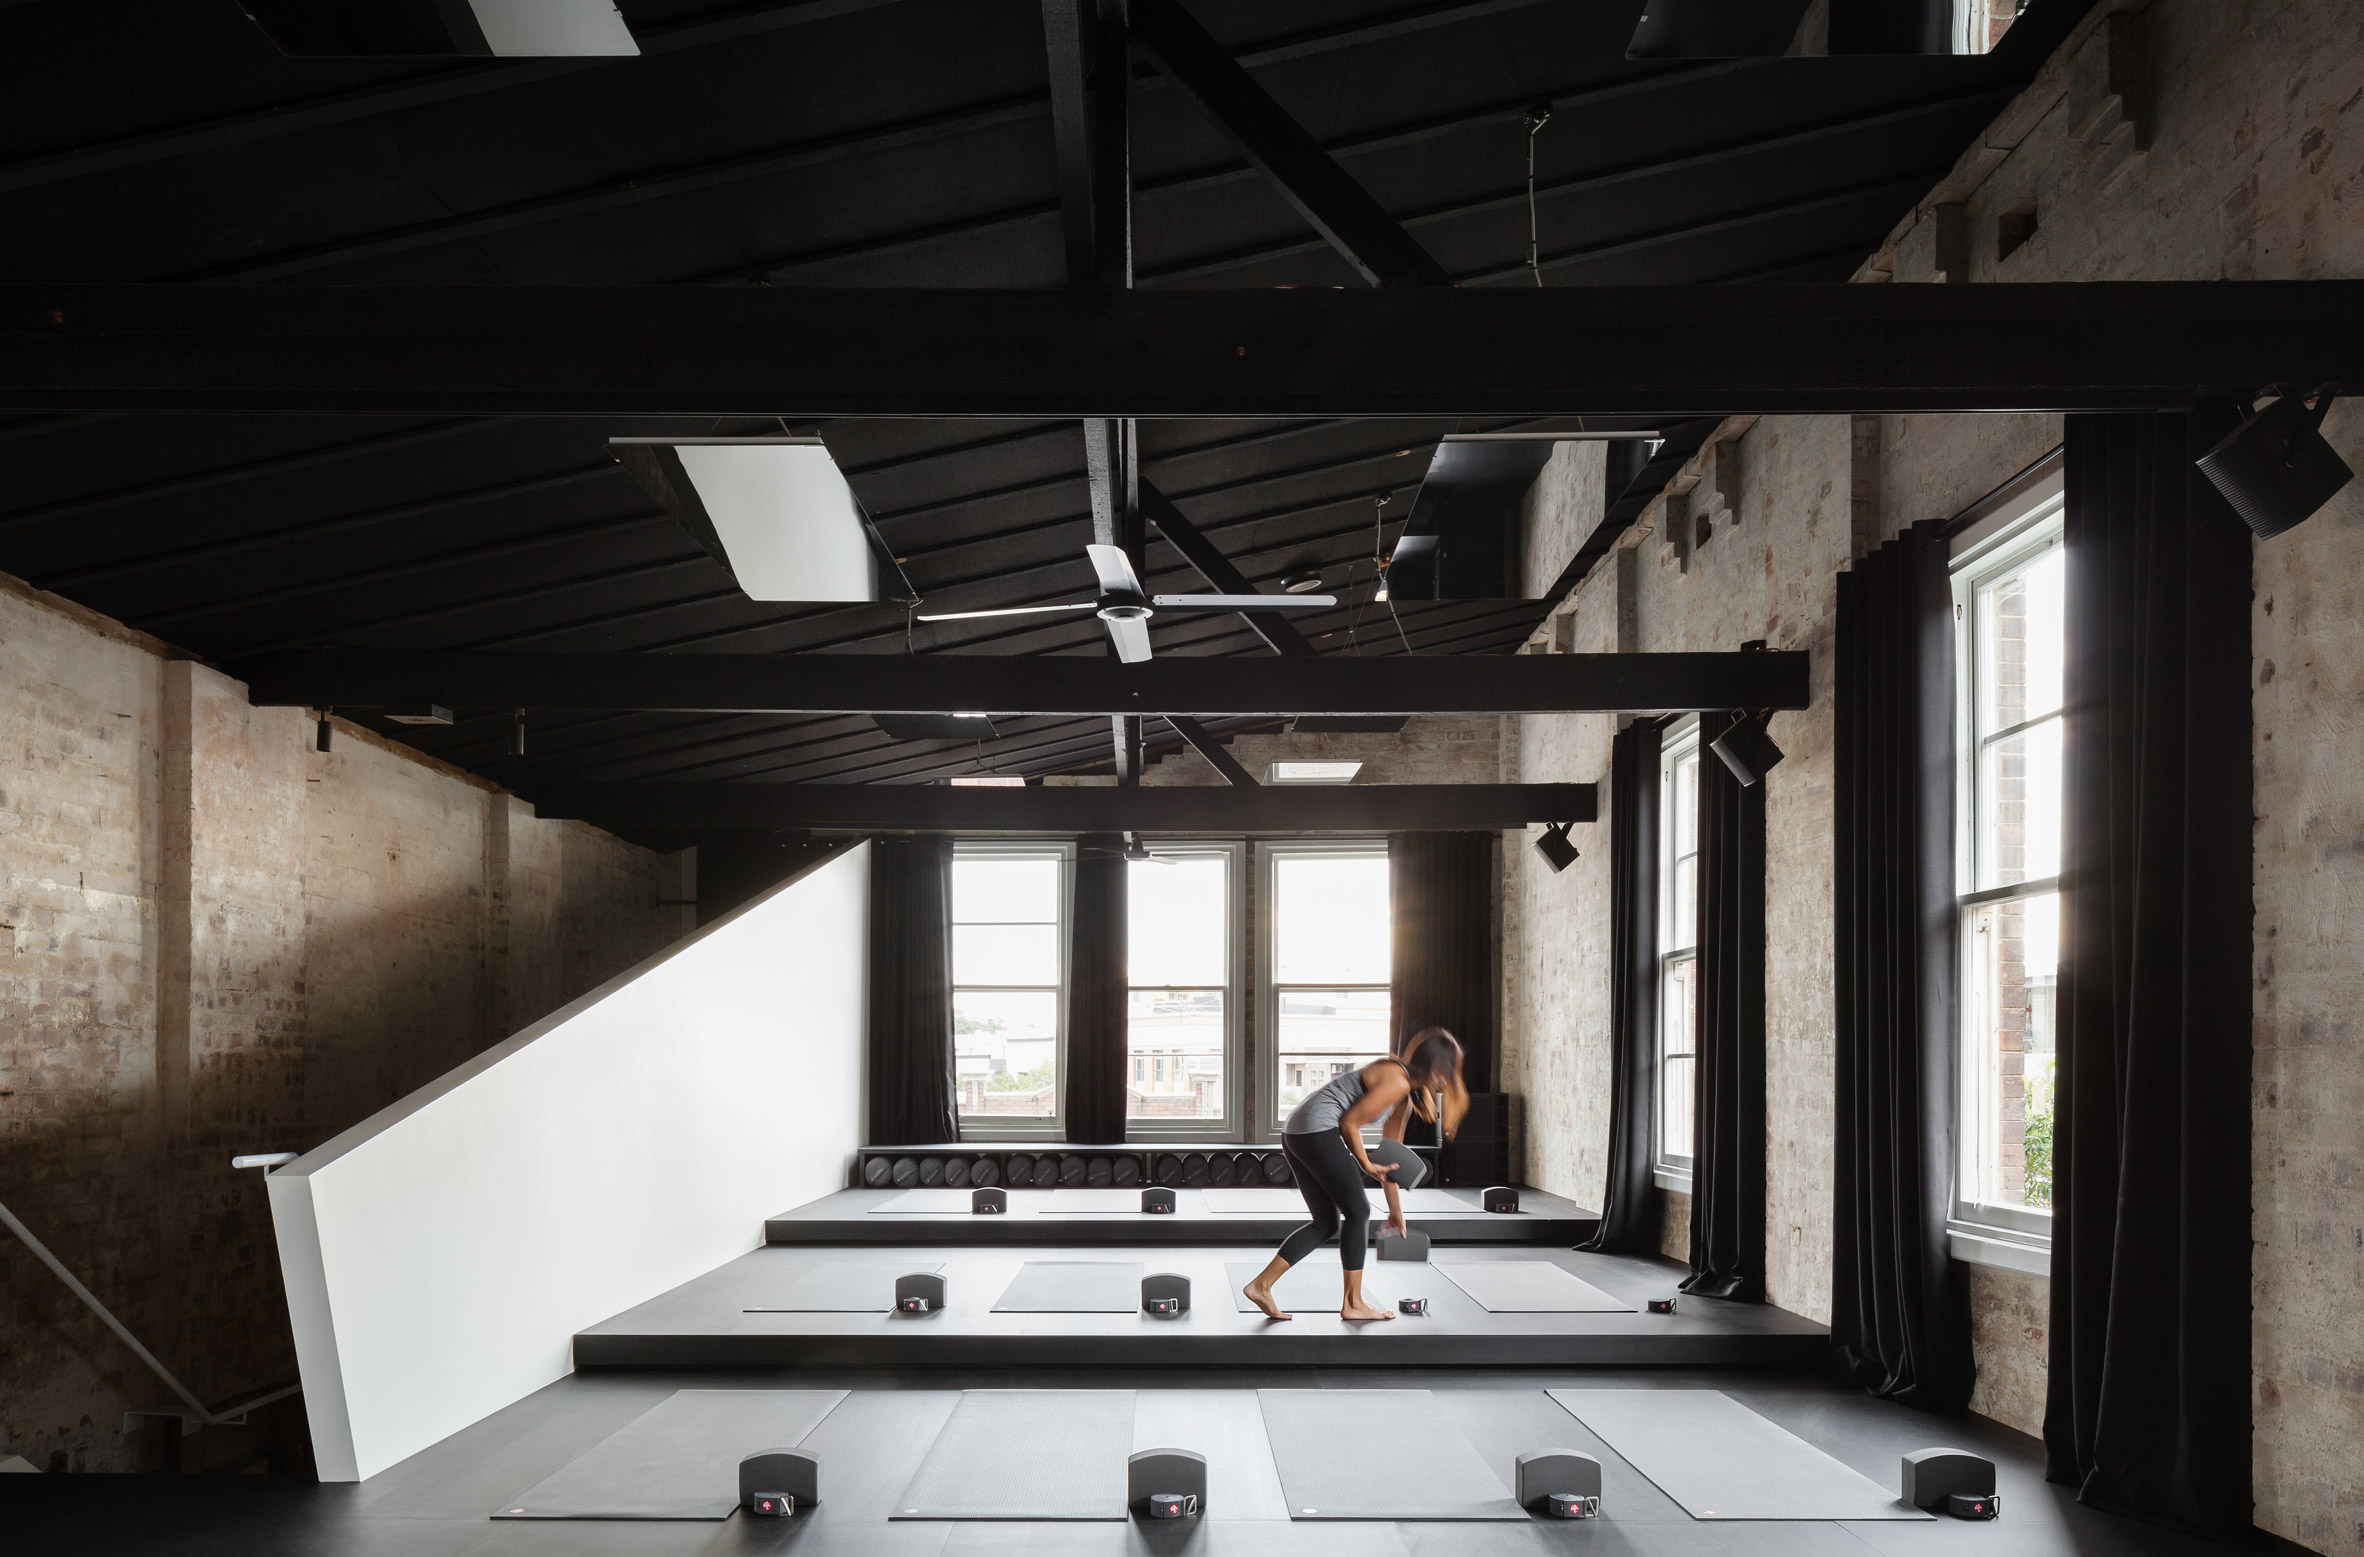 De mooiste yoga studio ter wereld!